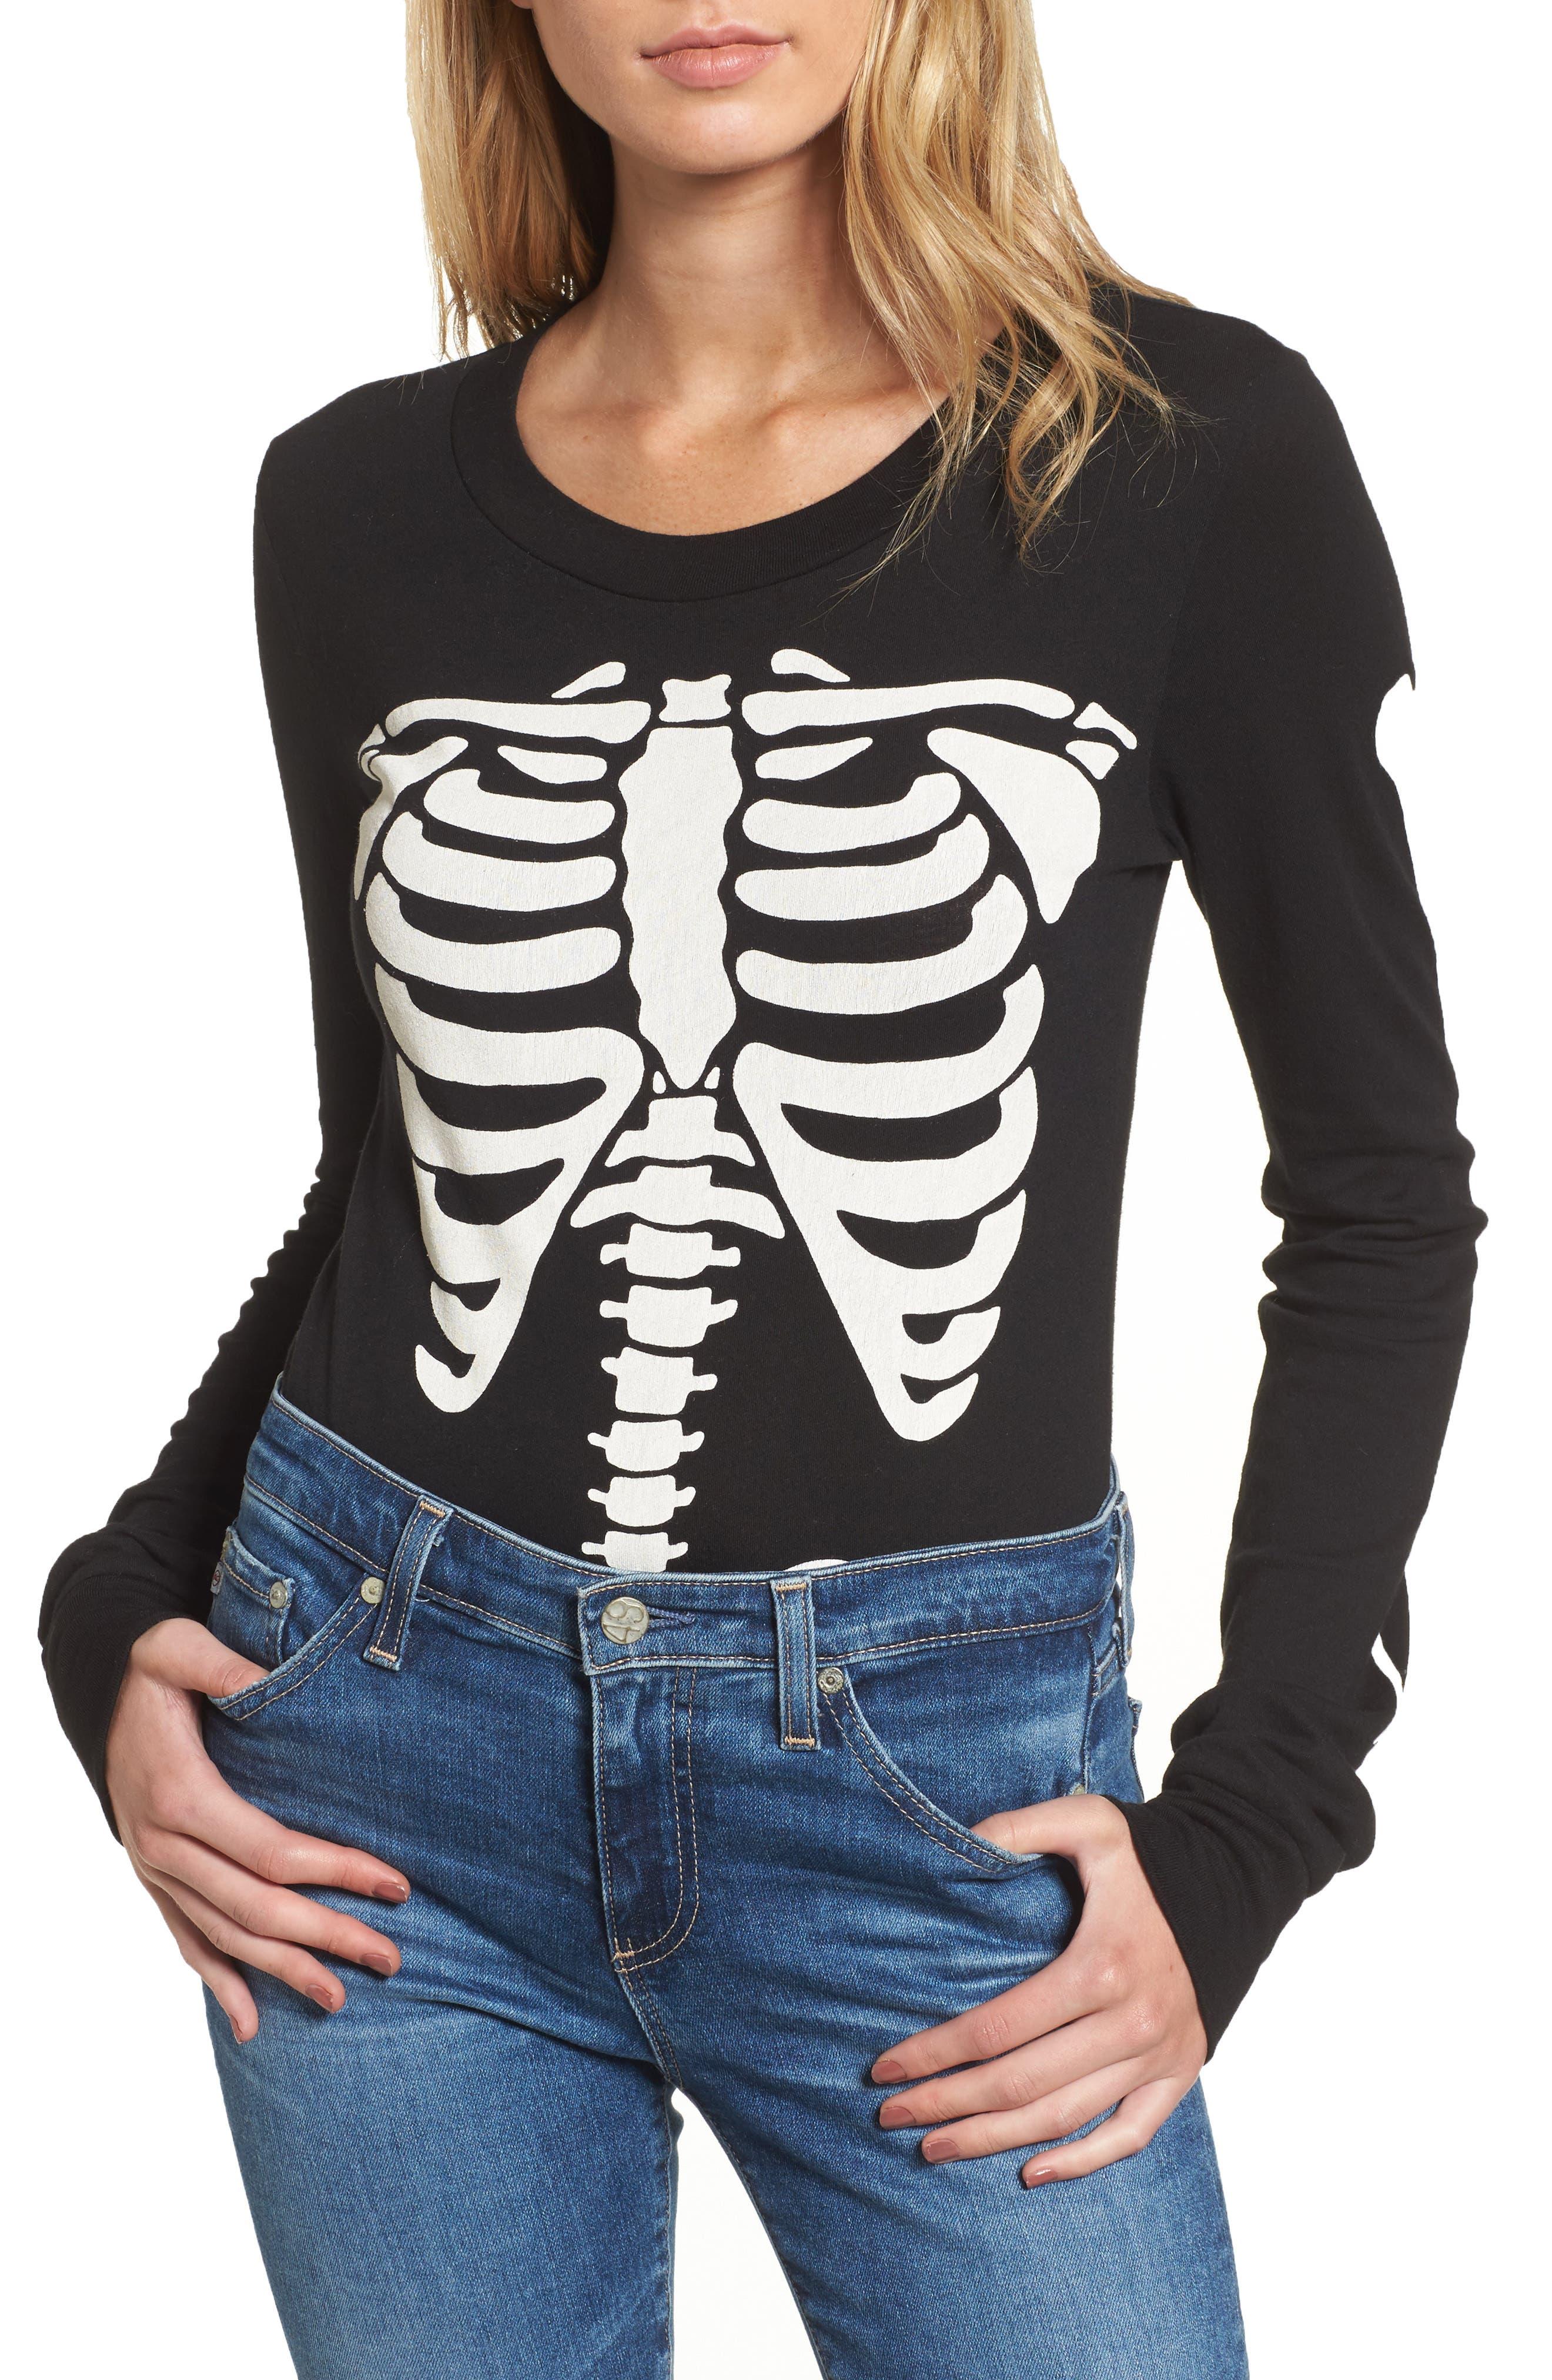 X-Ray Vision Bodysuit,                             Main thumbnail 1, color,                             001